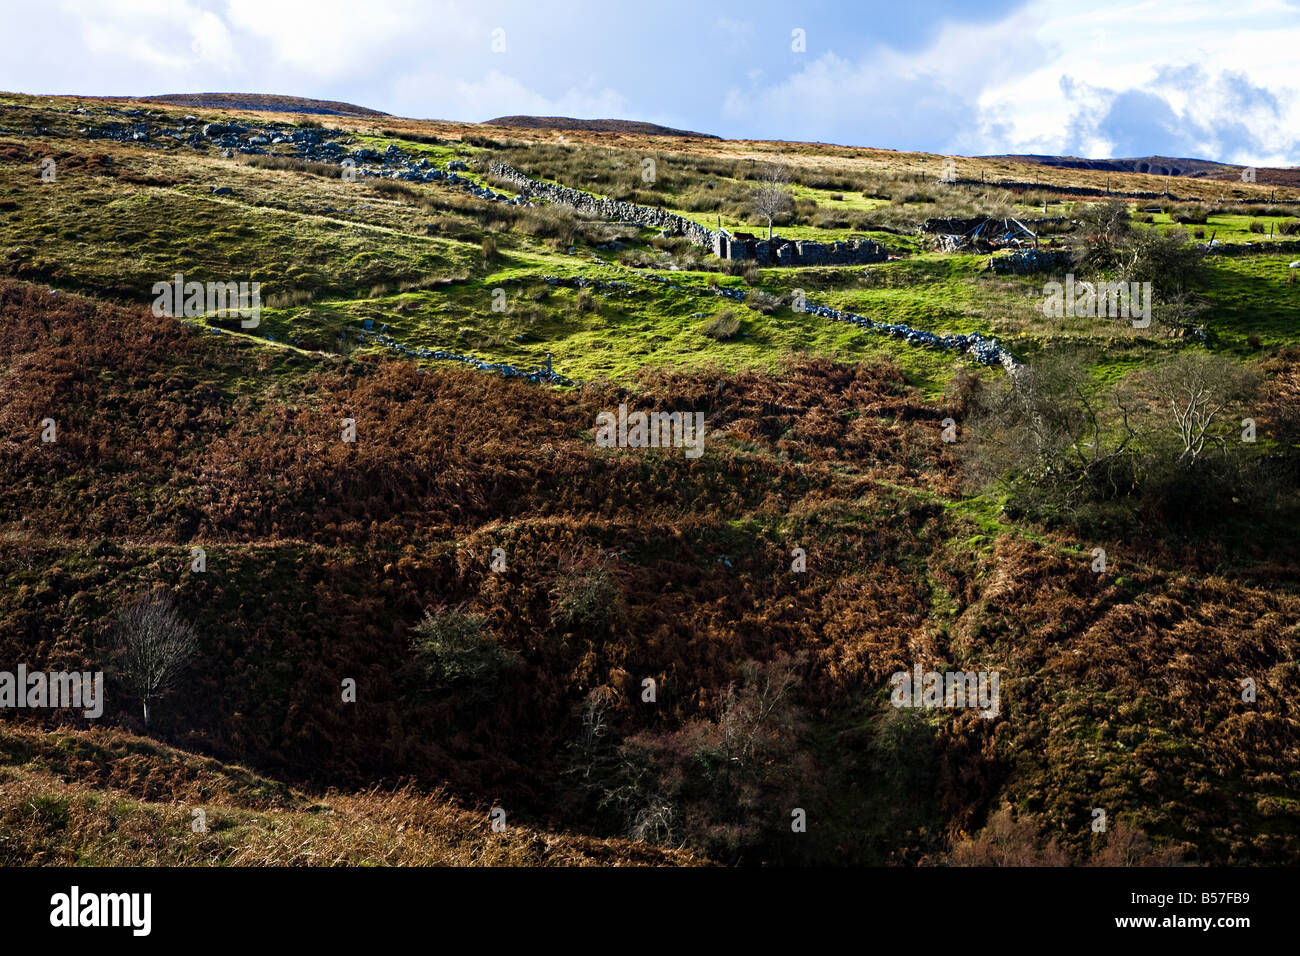 Ruined barn in industrial landscape with mining inclines Pwll Du hillside near Blaenavon Wales UK - Stock Image